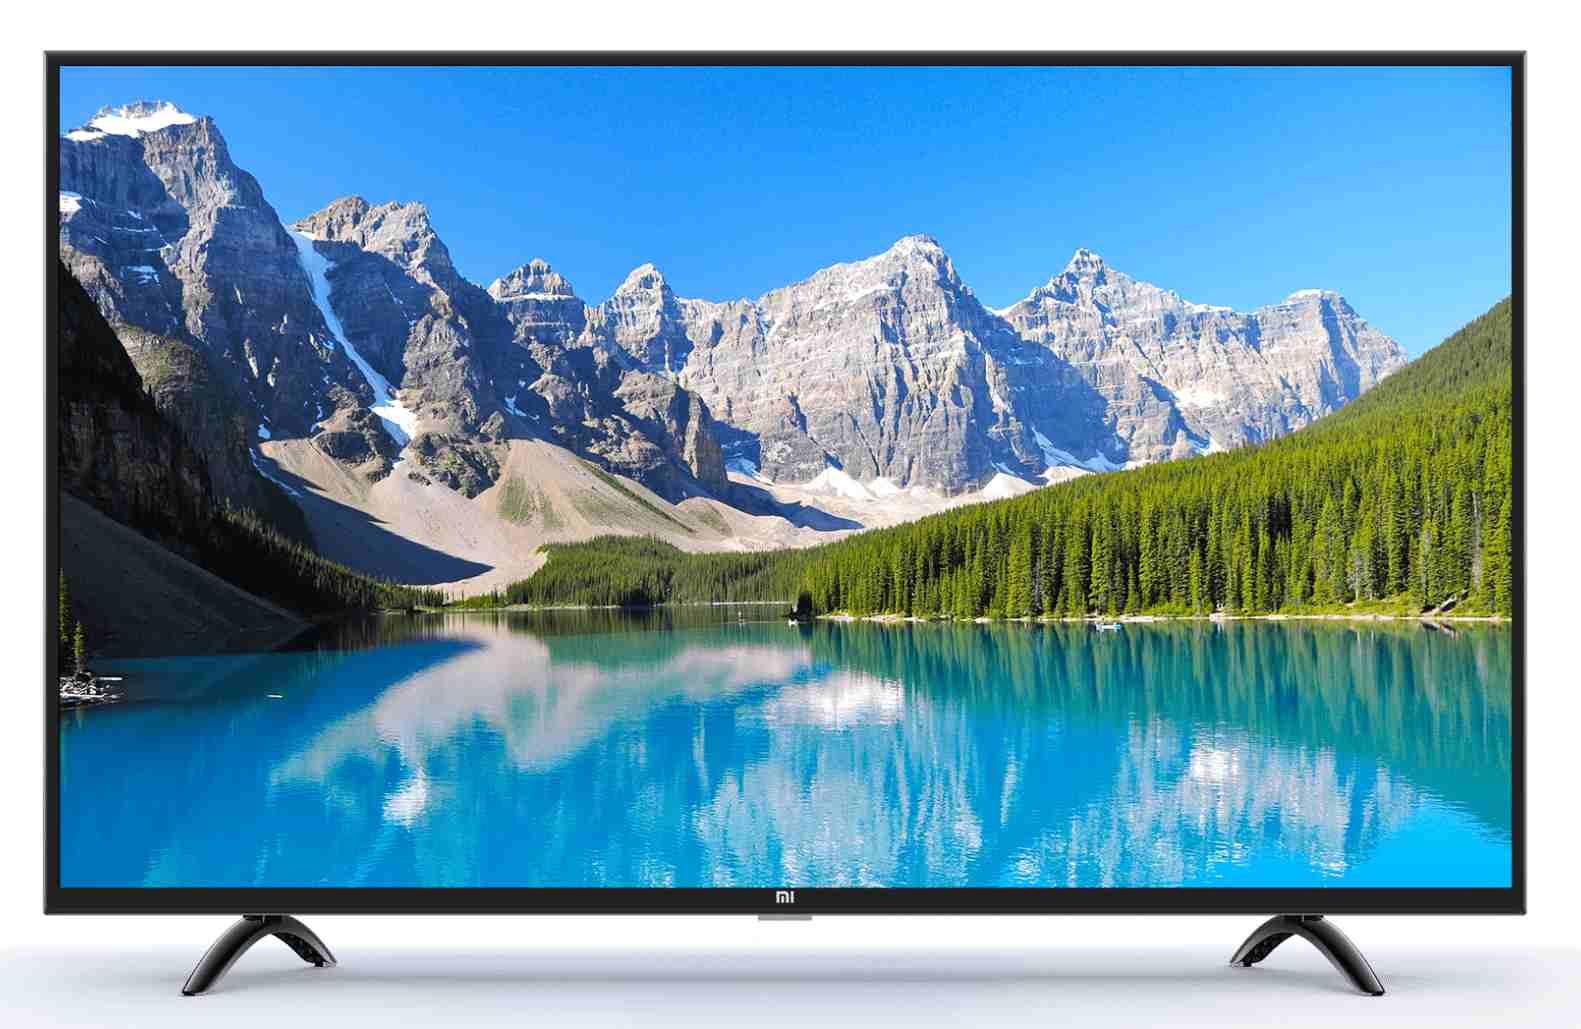 MI TV Picture Quality